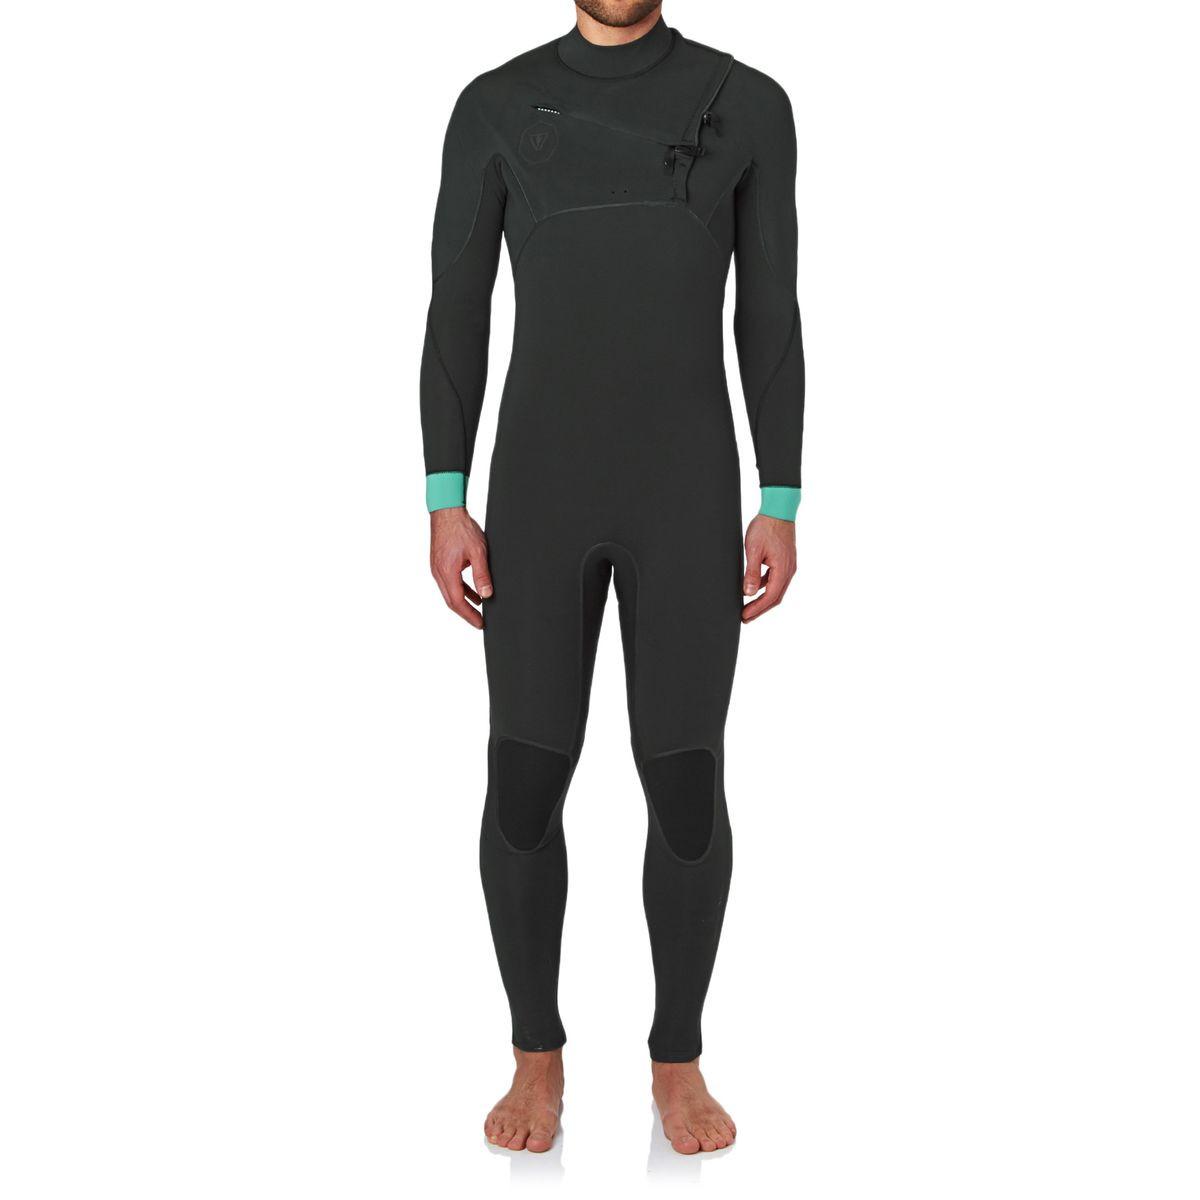 Vissla Eco Seas 3/2mm 2017 Chest Zip Wetsuit - Stealth